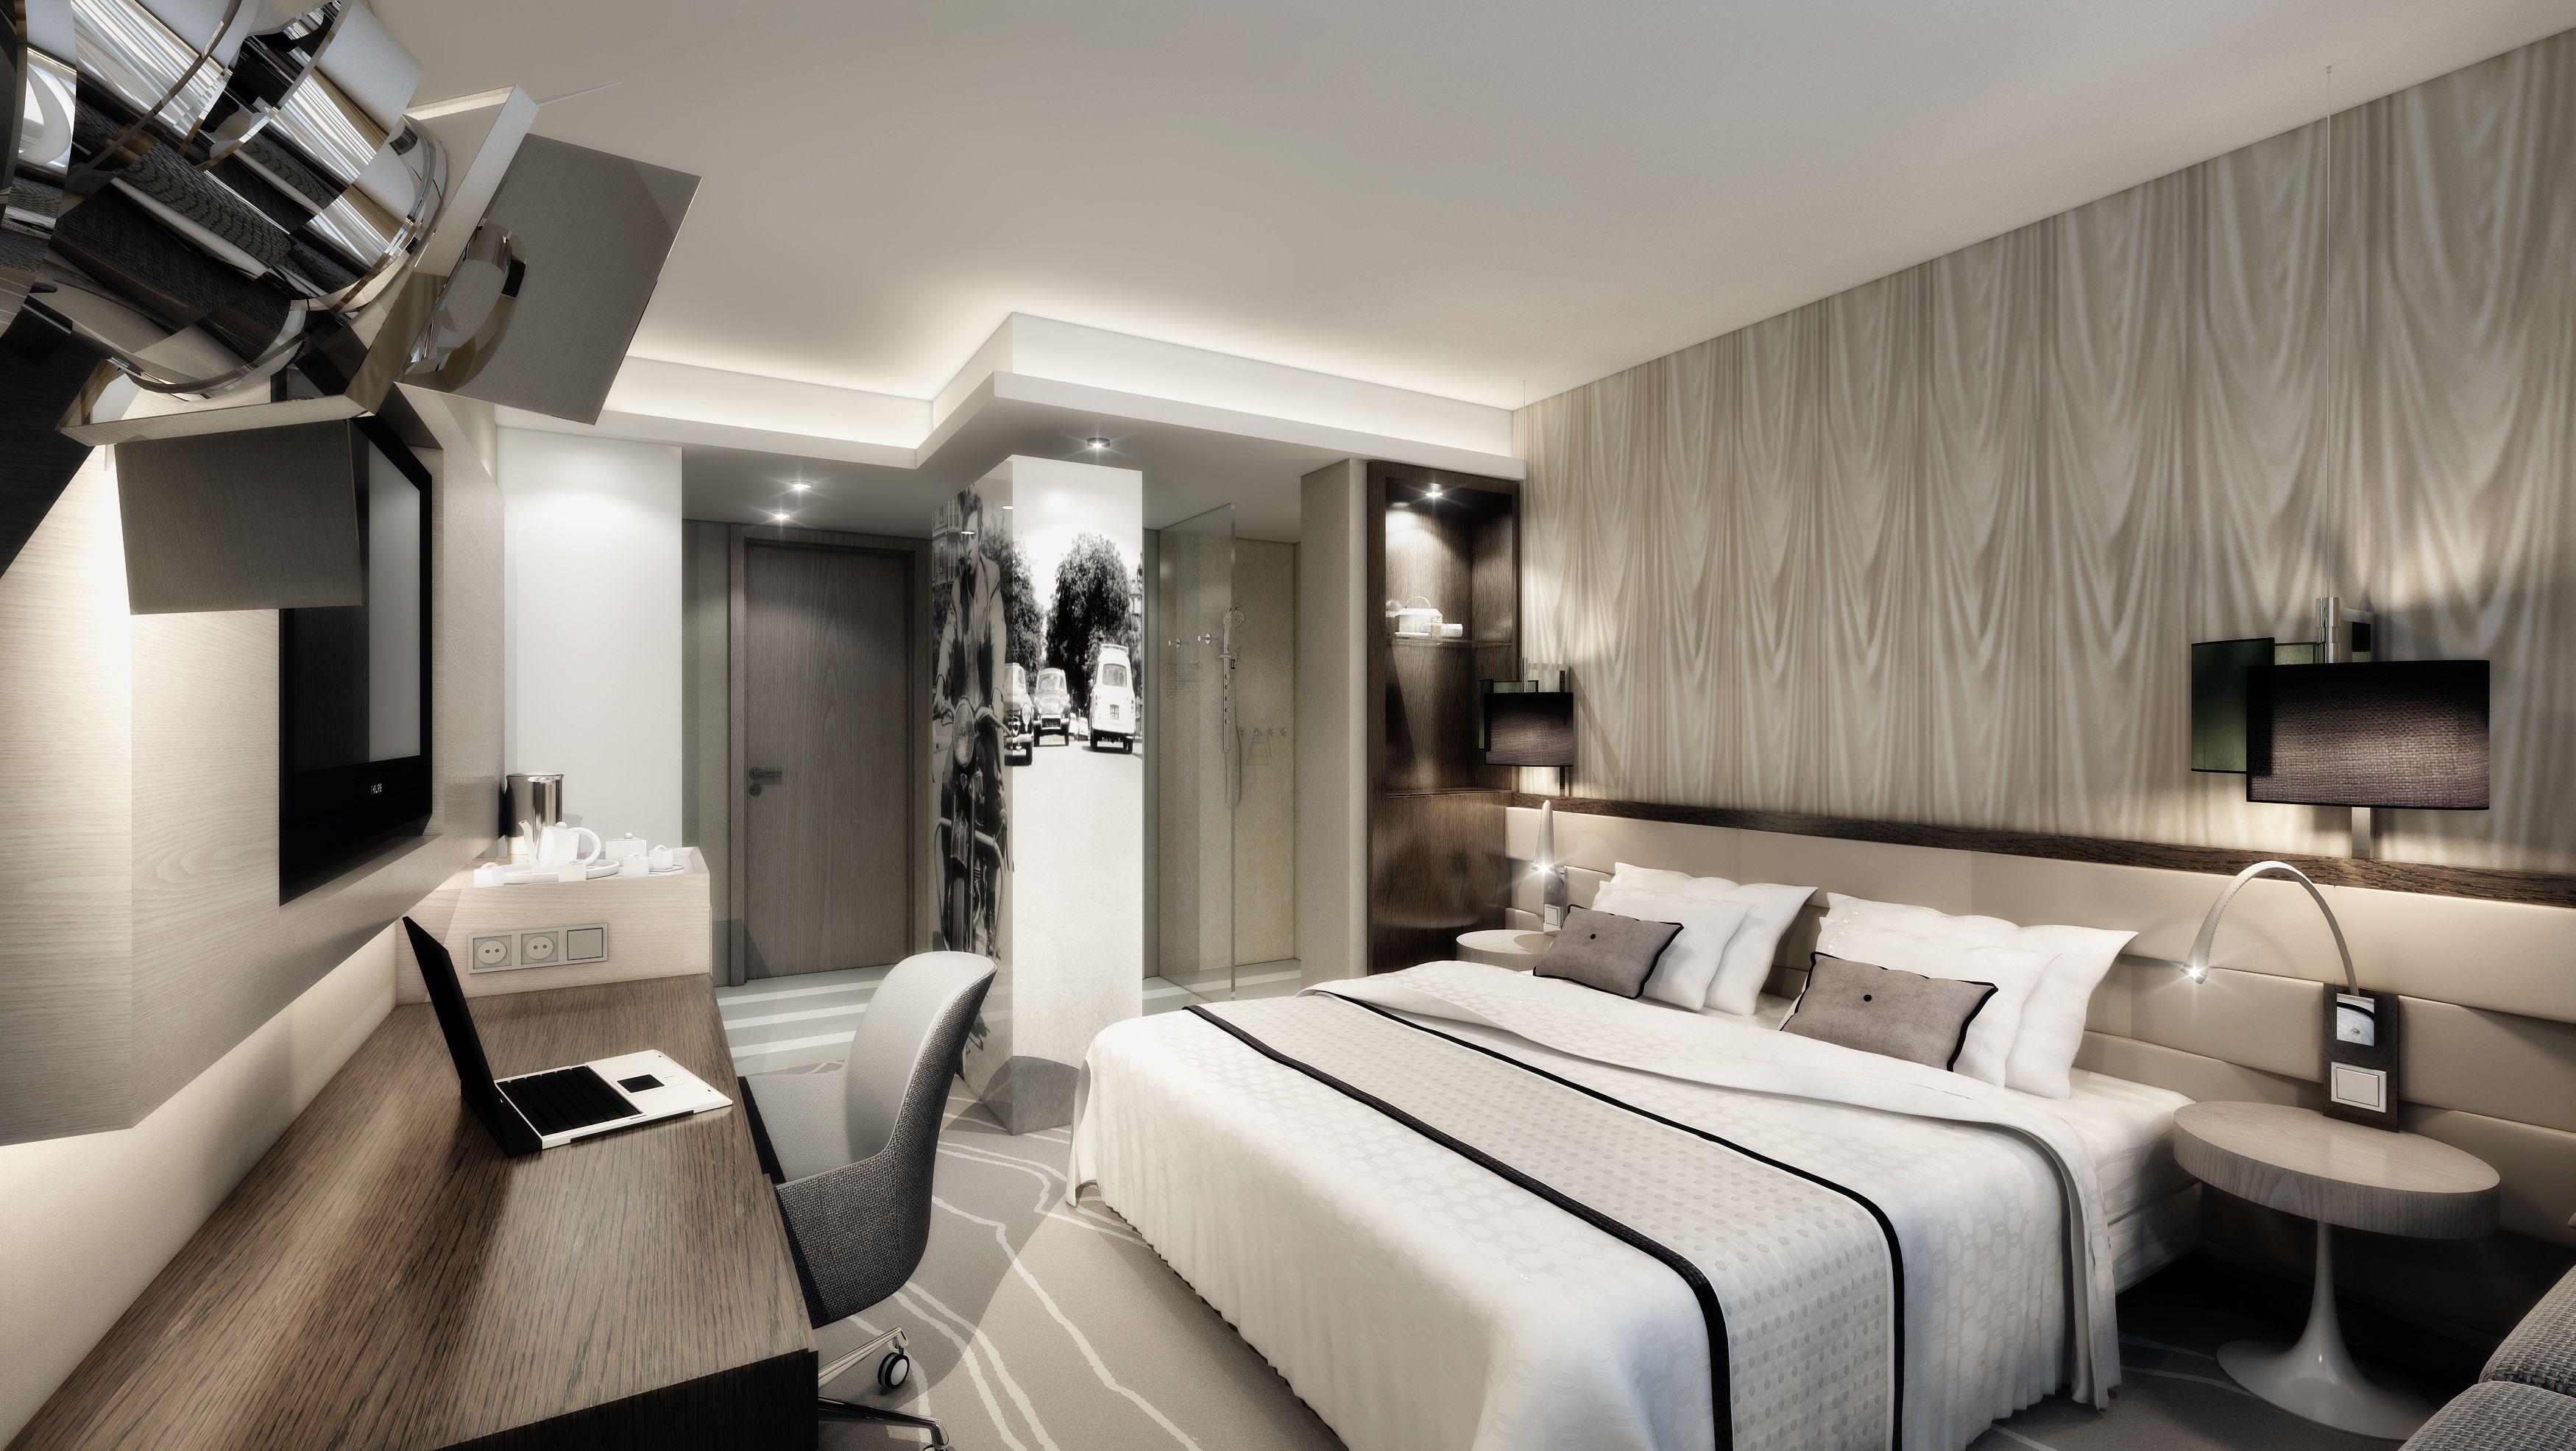 Feuring e magazine hotel kompetenz zentrum joi design for Zimmer designer